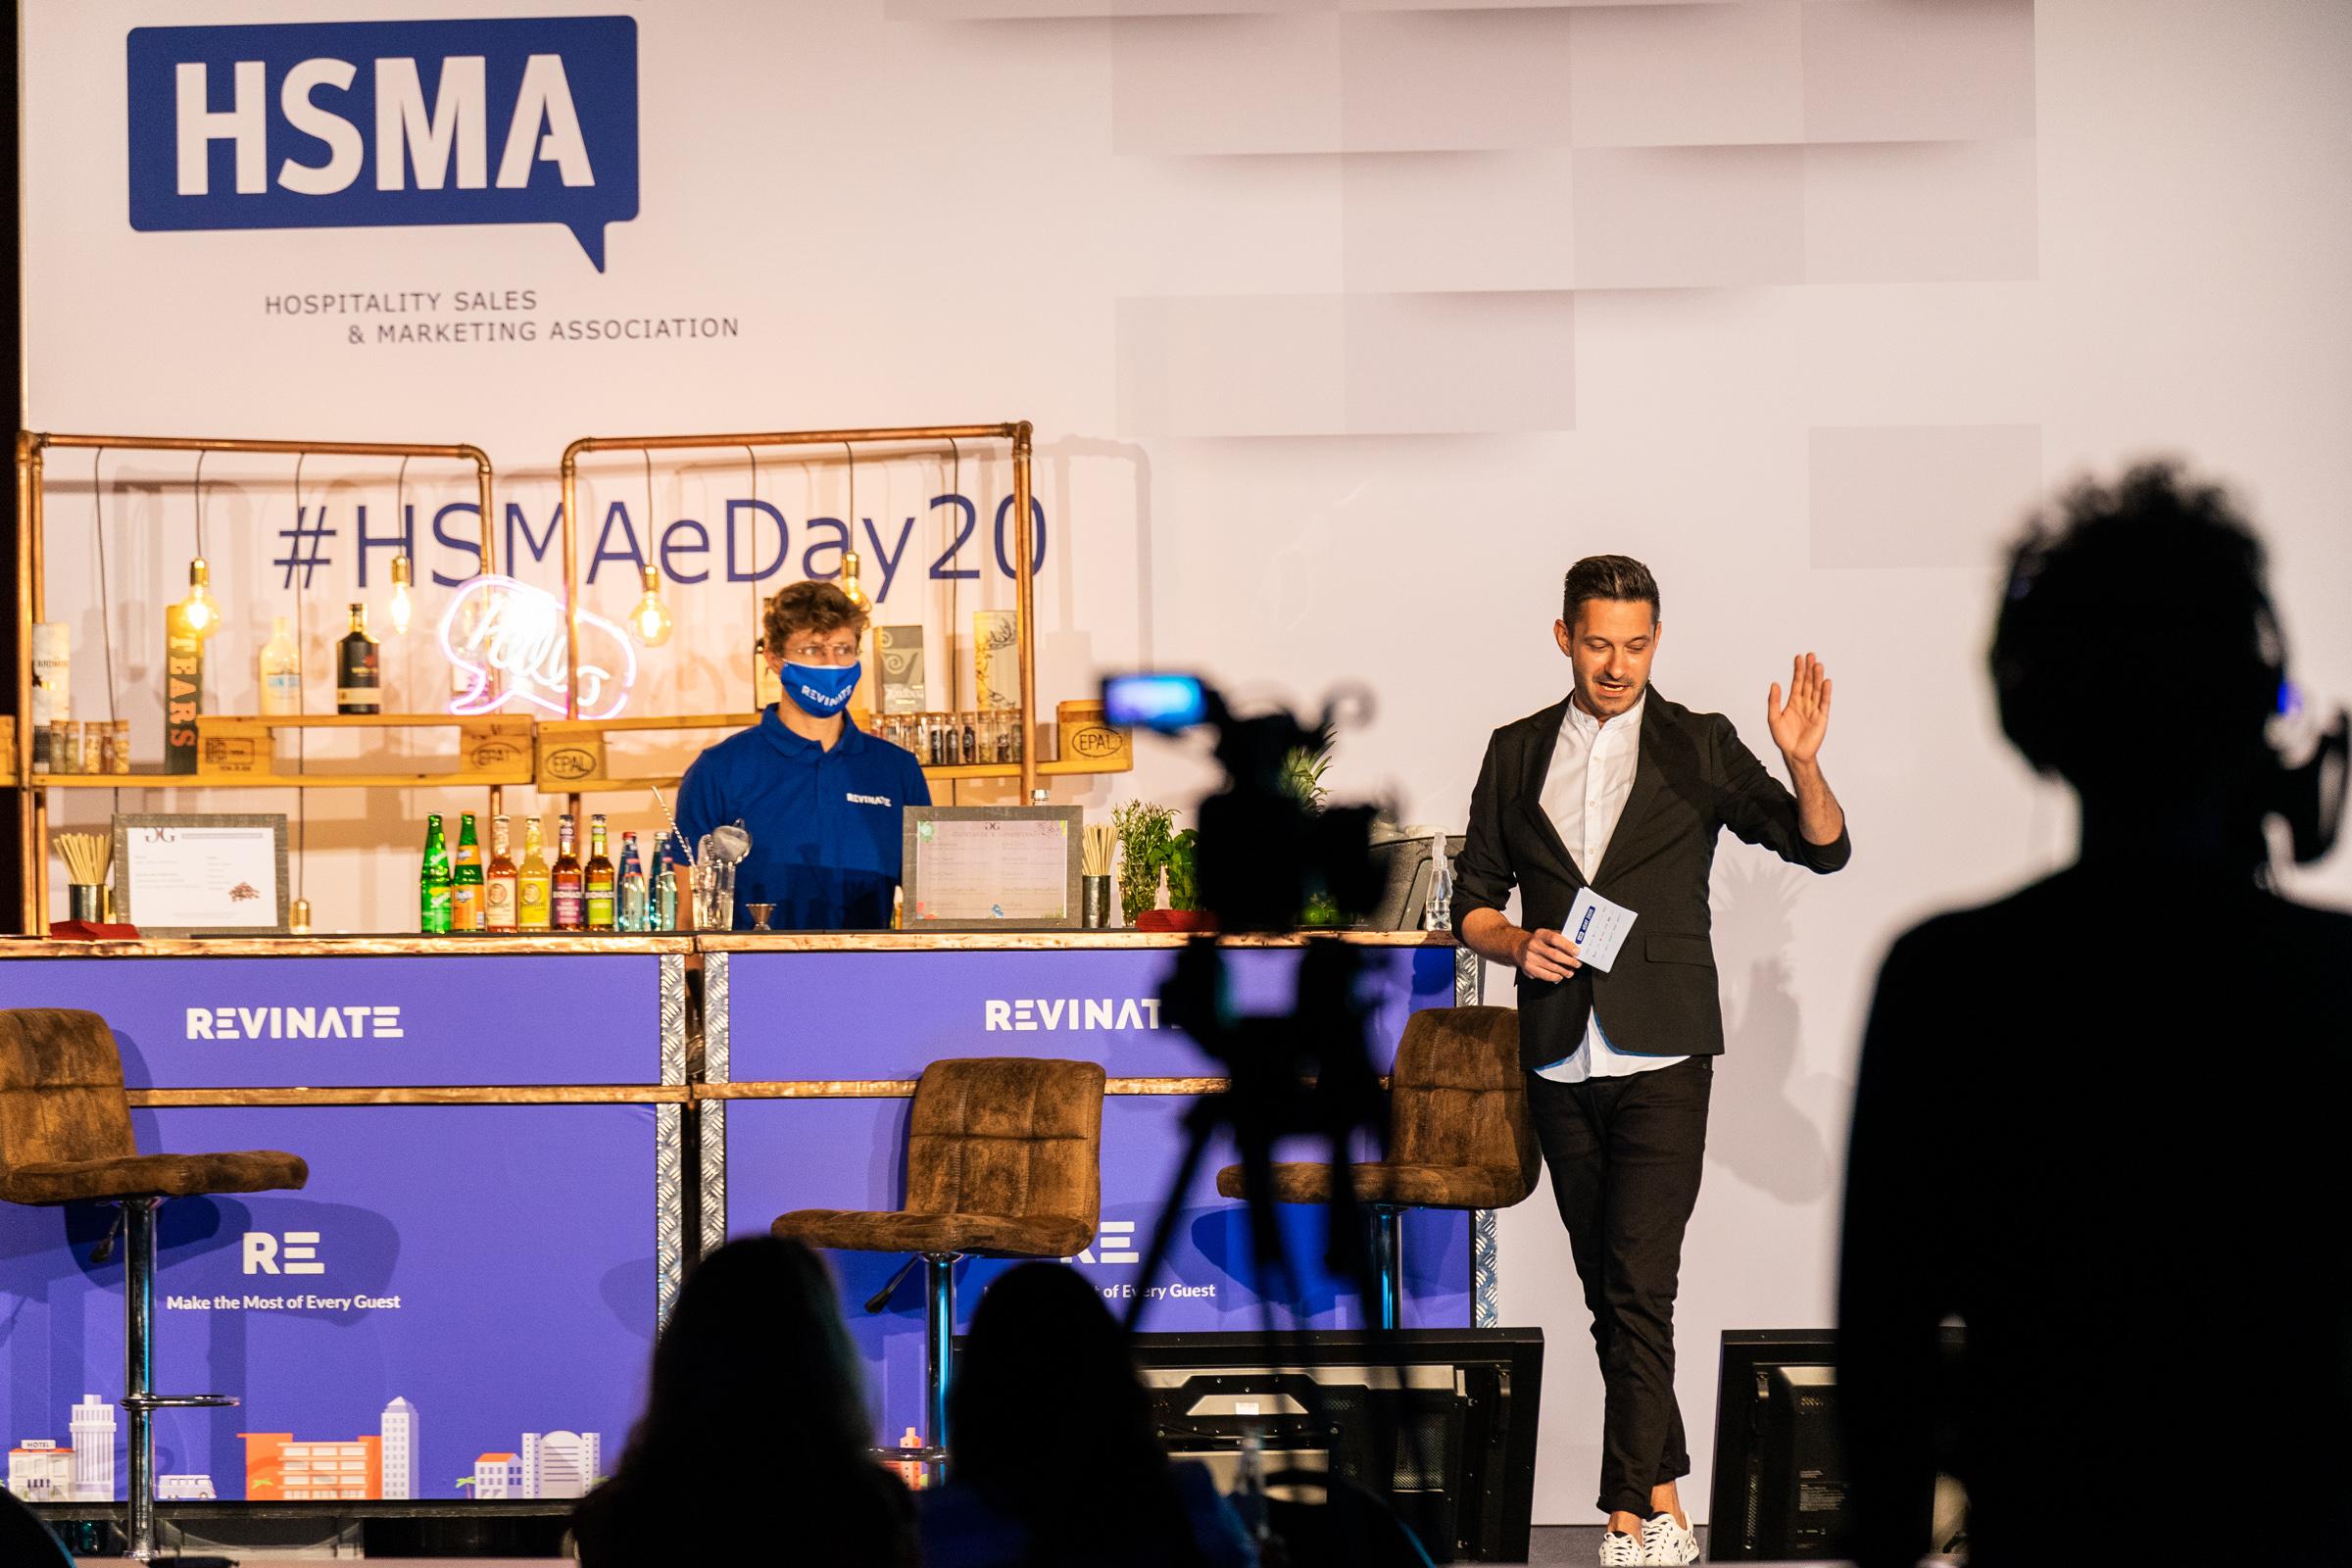 HSMA eDay 2020 l Berlin, Germany